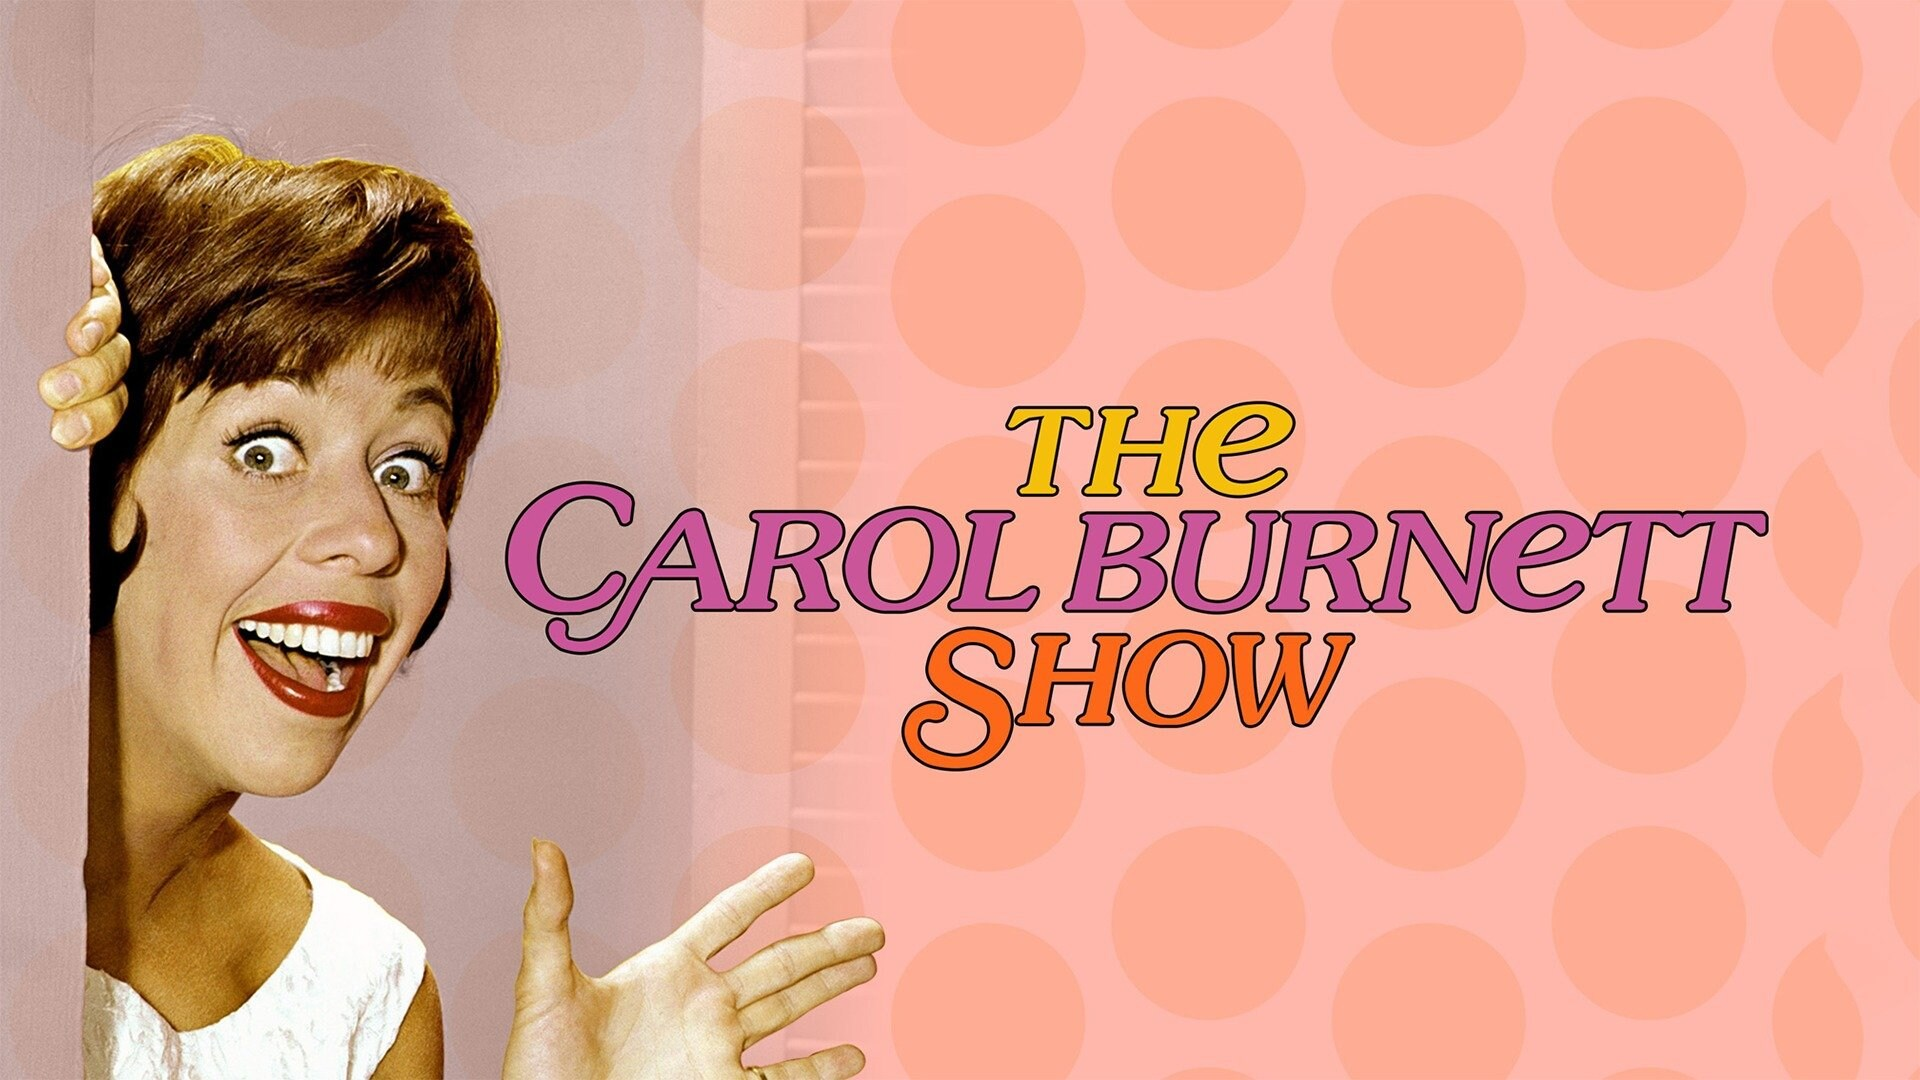 The Carol Burnett Show: Tim Conway, Ruth Buzzi